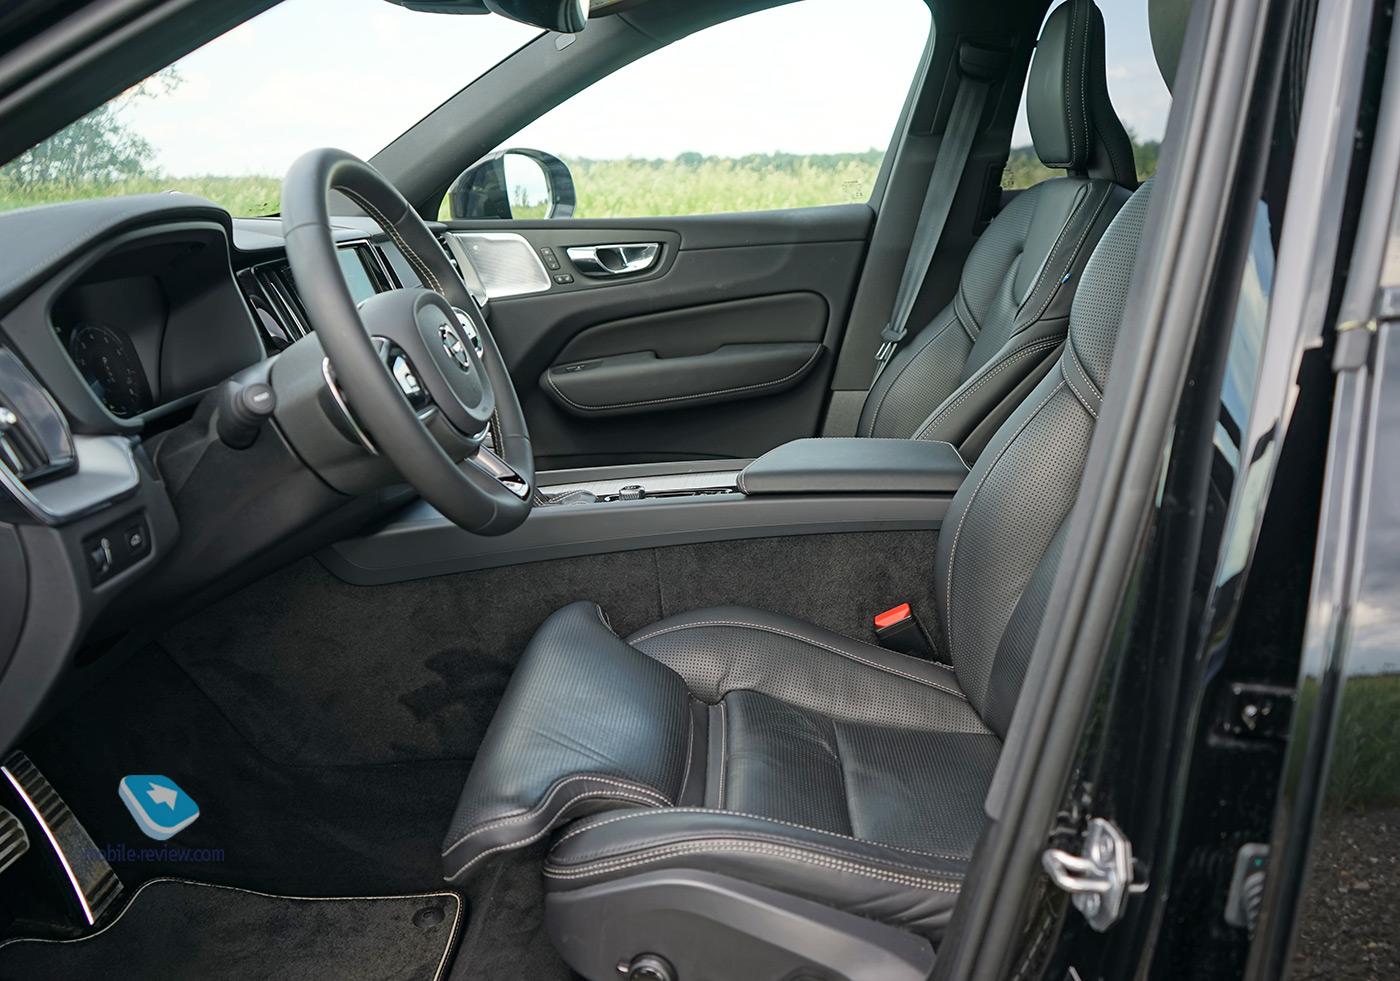 Тест Volvo XC60. Из Швеции с любовью